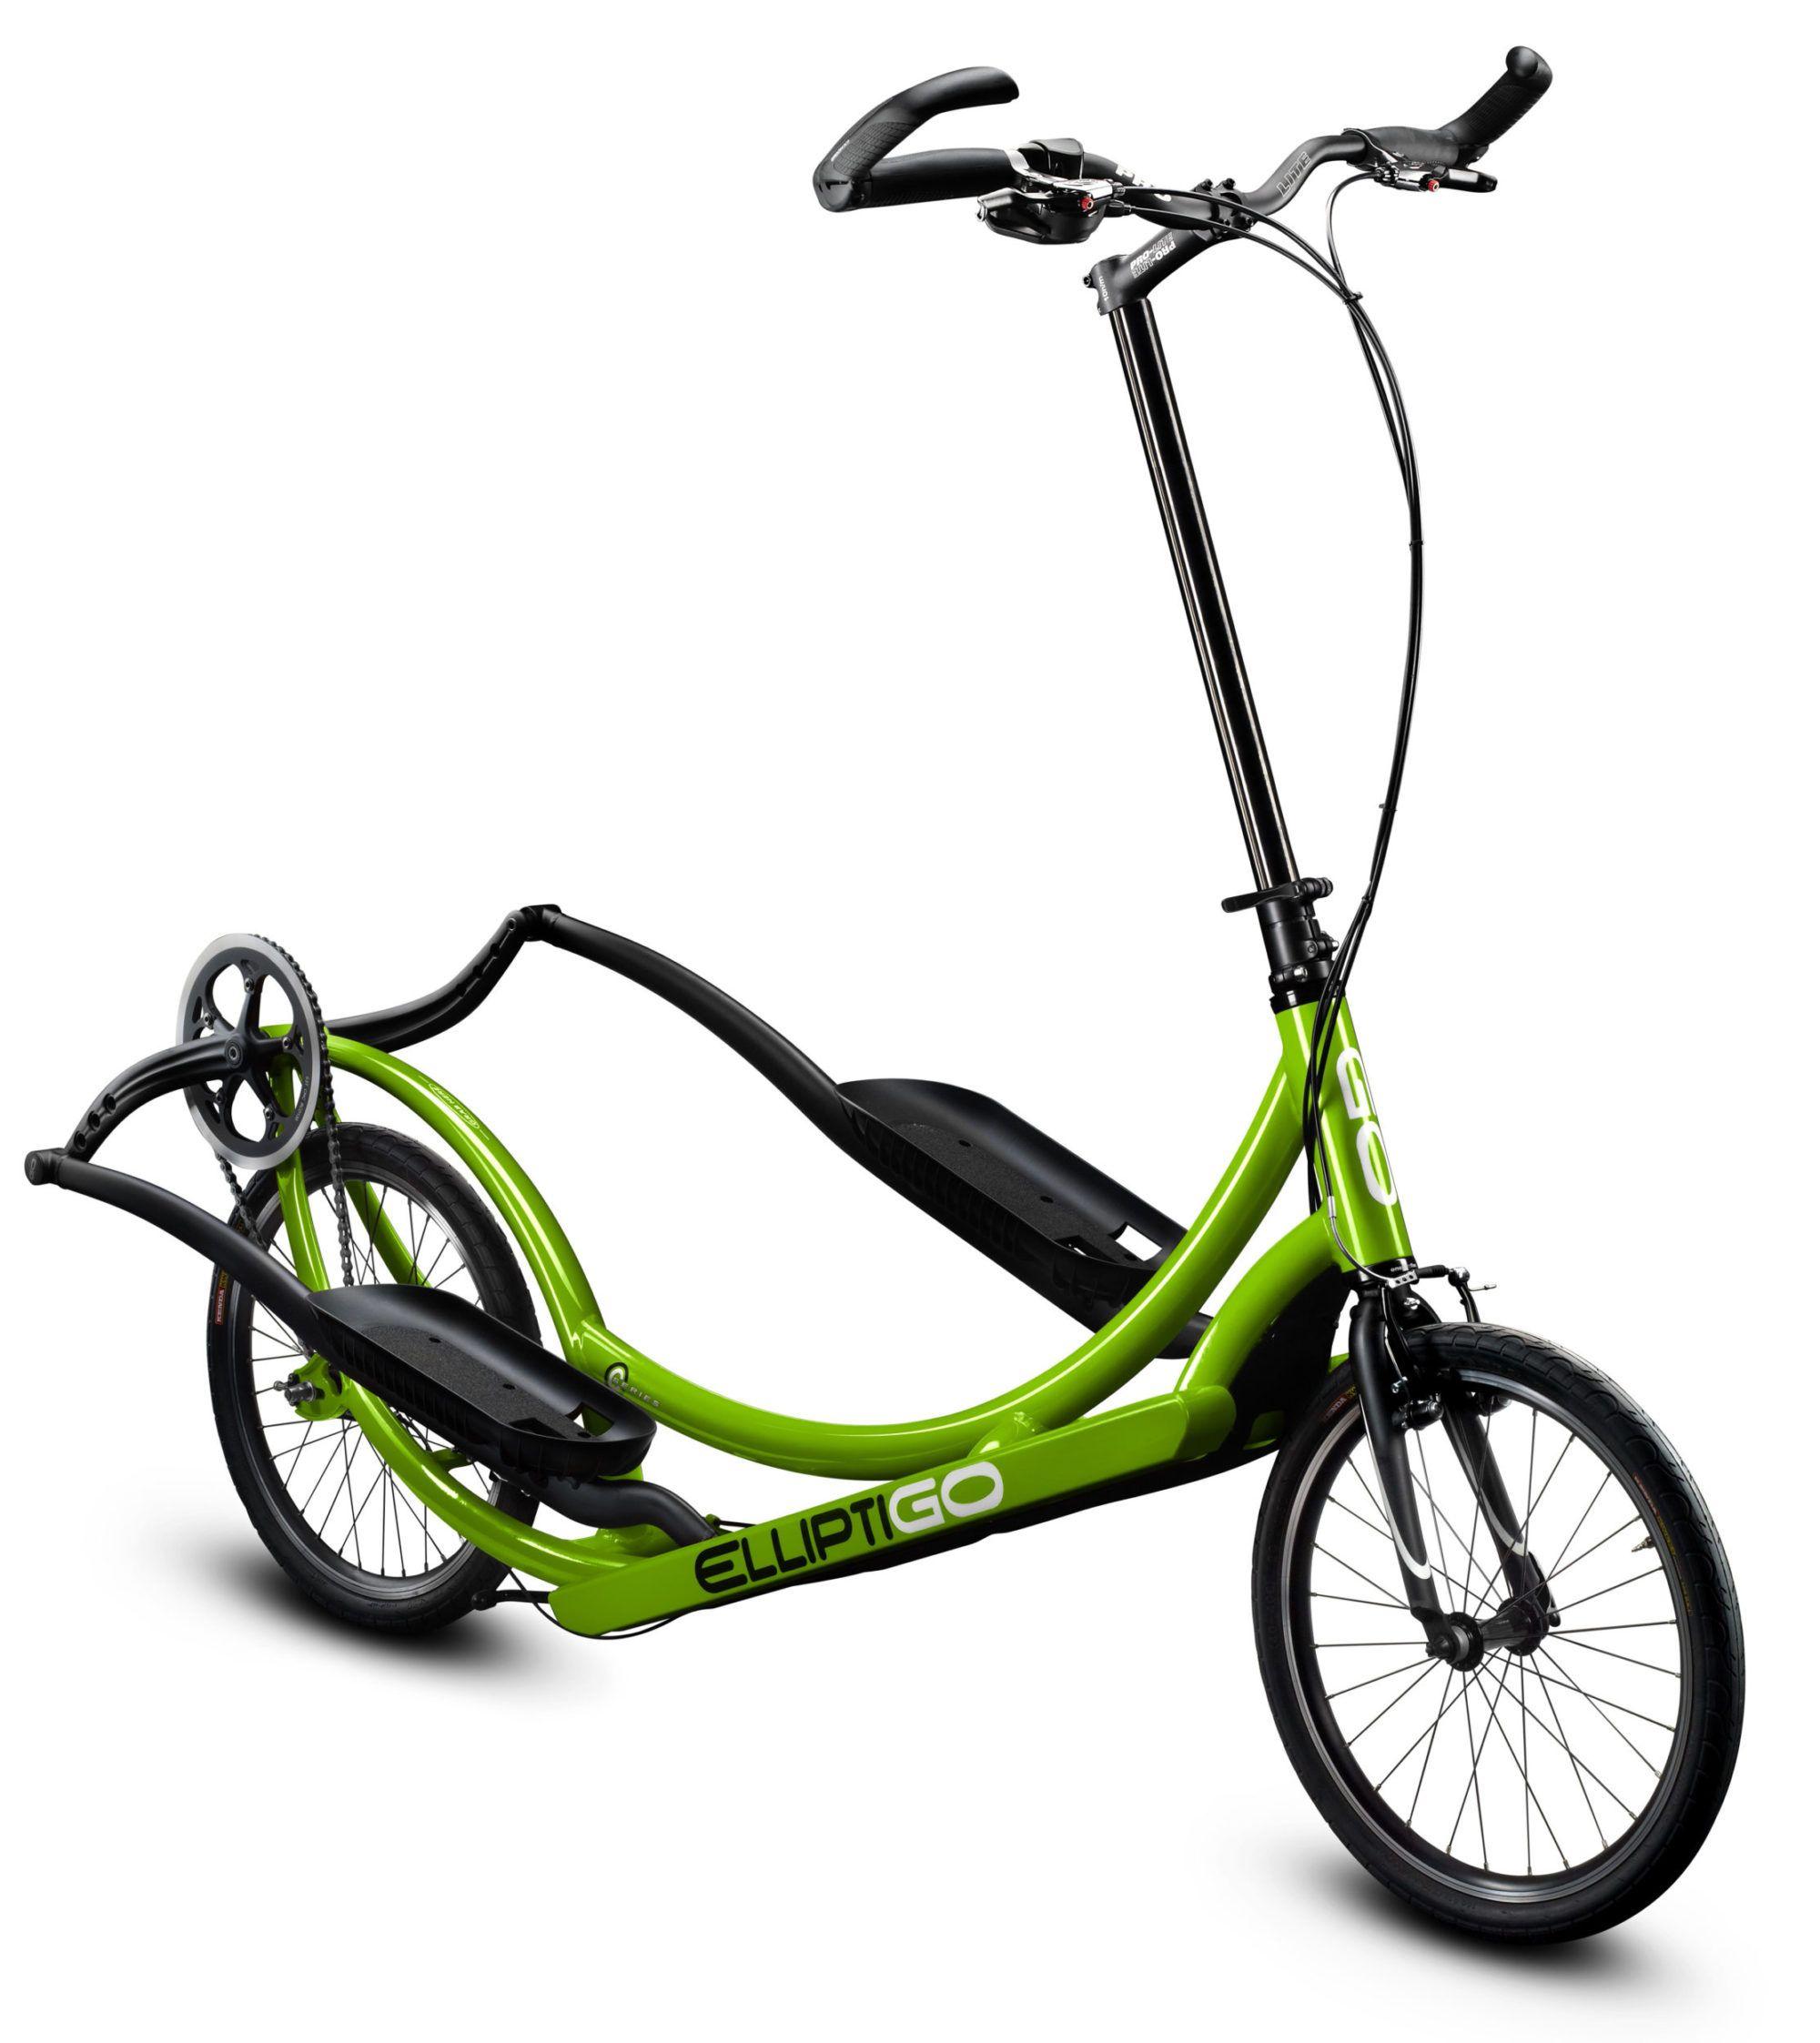 The Elliptigo Outdoor Elliptical Bicycle Combines The Best Of